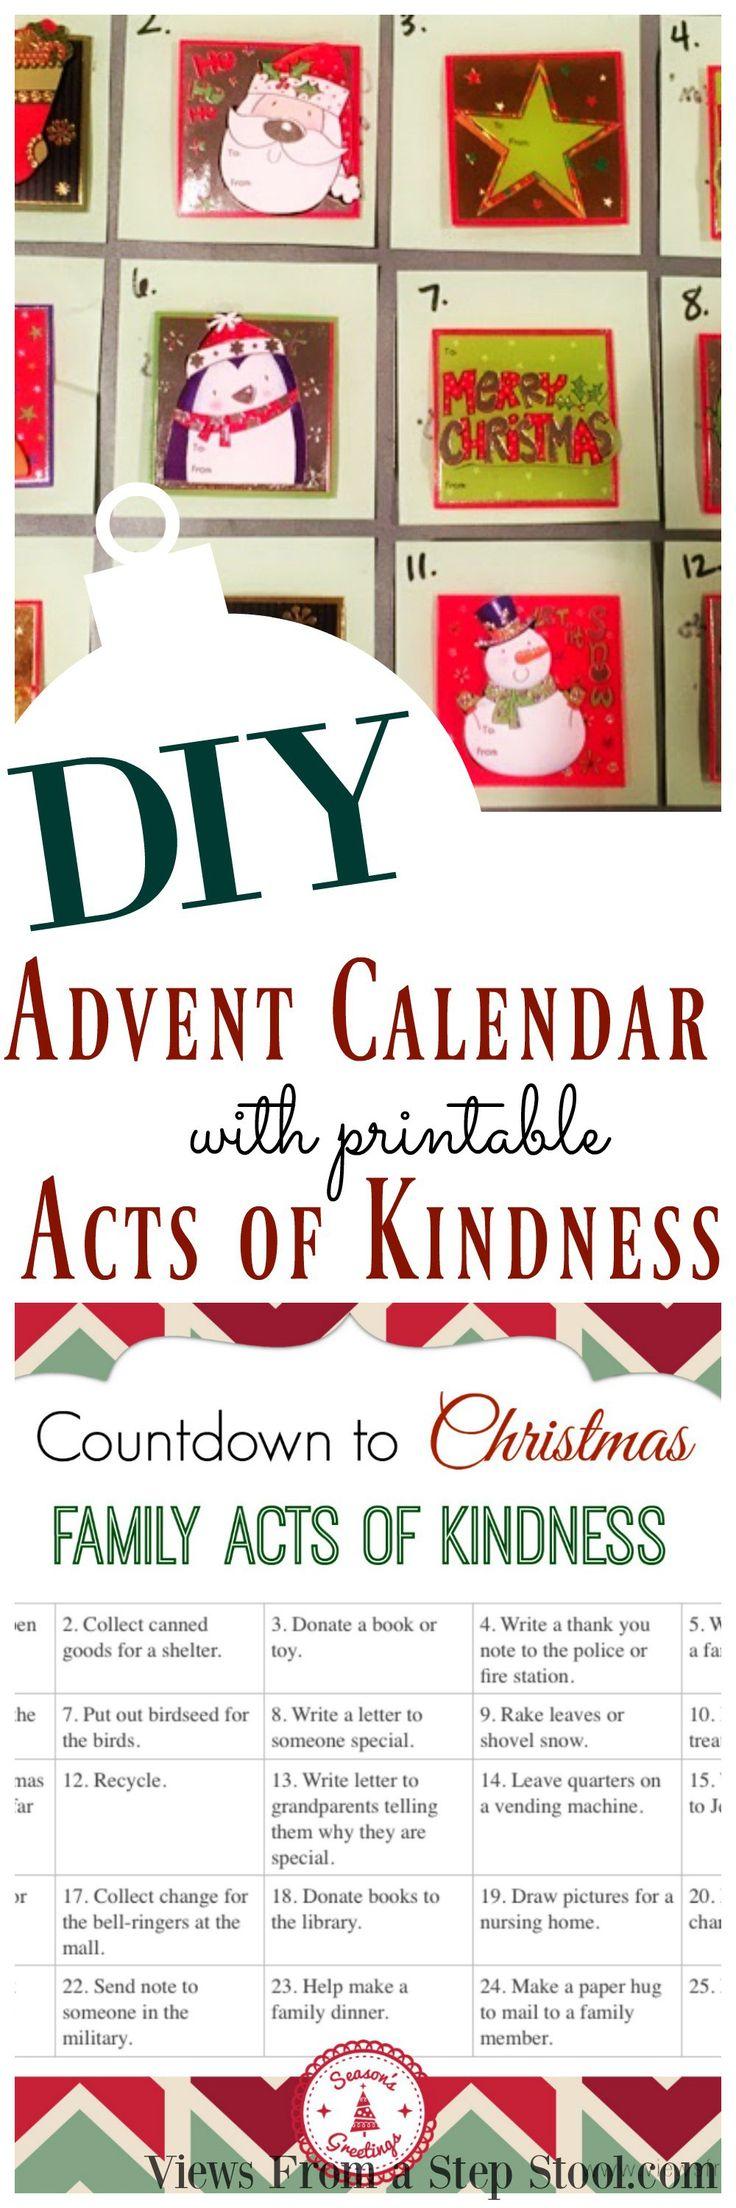 Diy Kindness Calendar : Unique homemade advent calendars ideas on pinterest